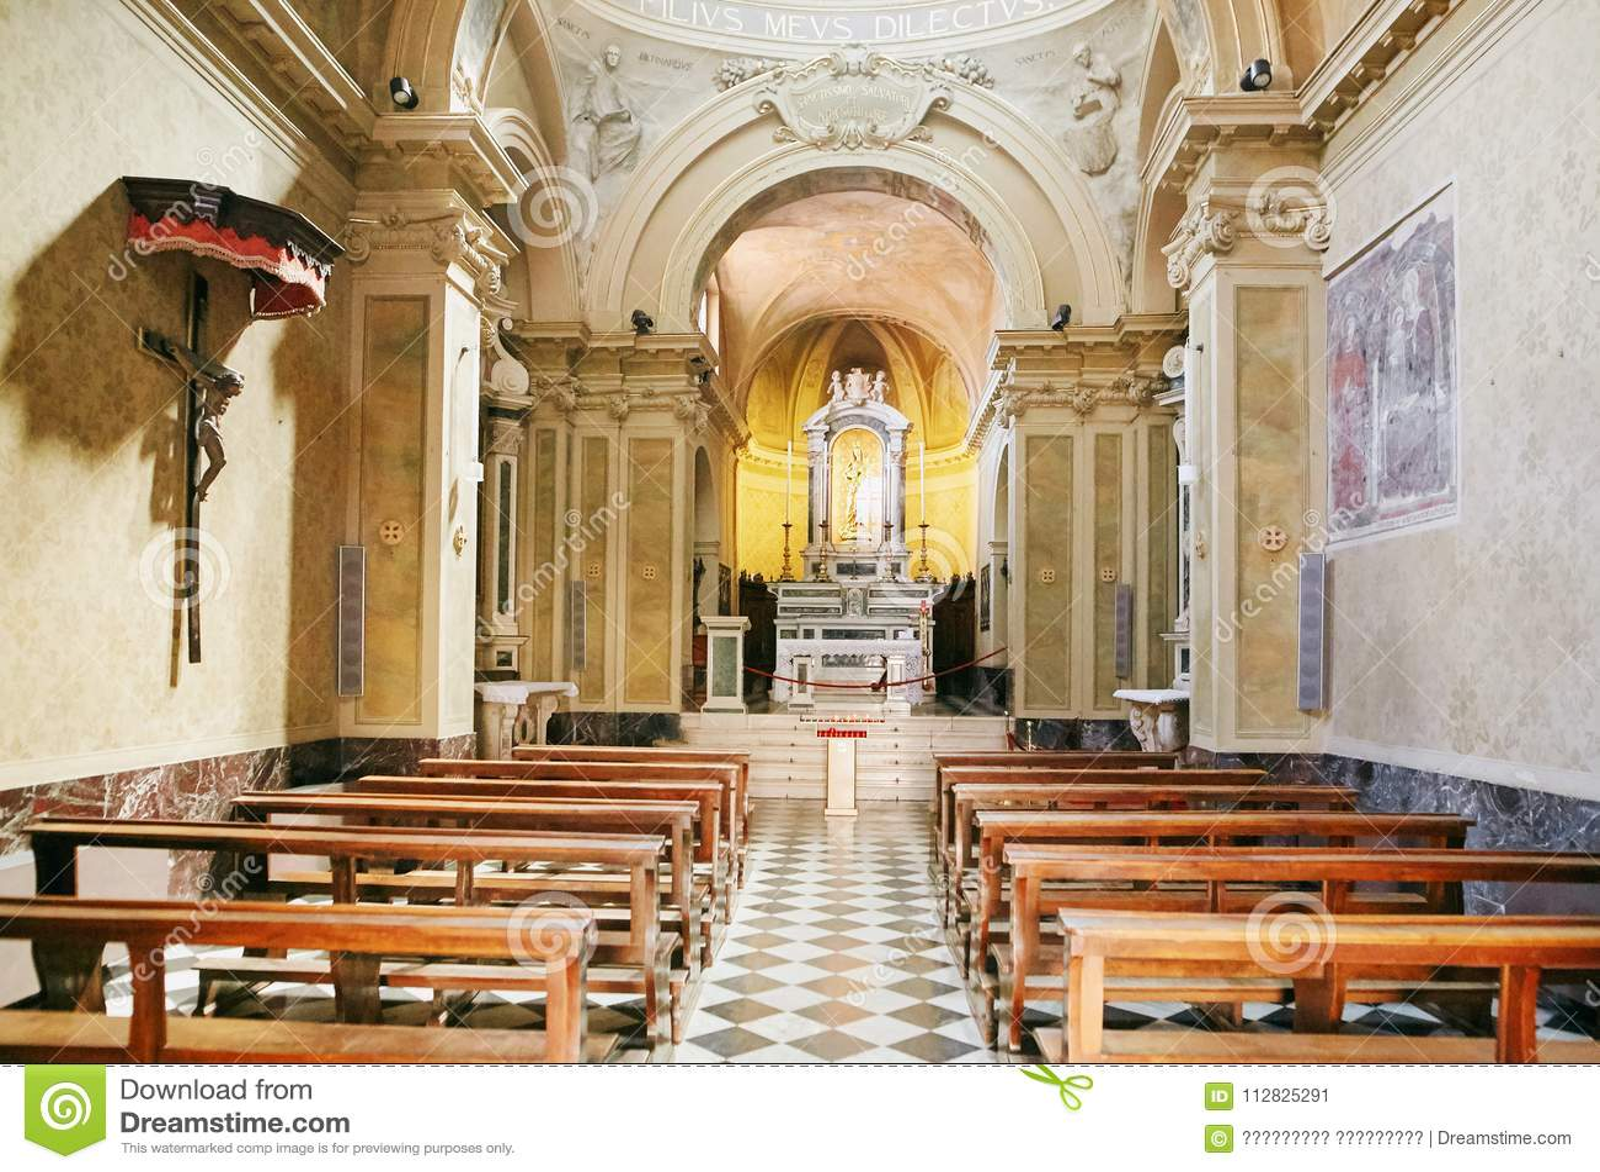 Amazing bergamo italy august interior of the cathedral duomo of bergamo and the baptistery with - Interior design bergamo ...